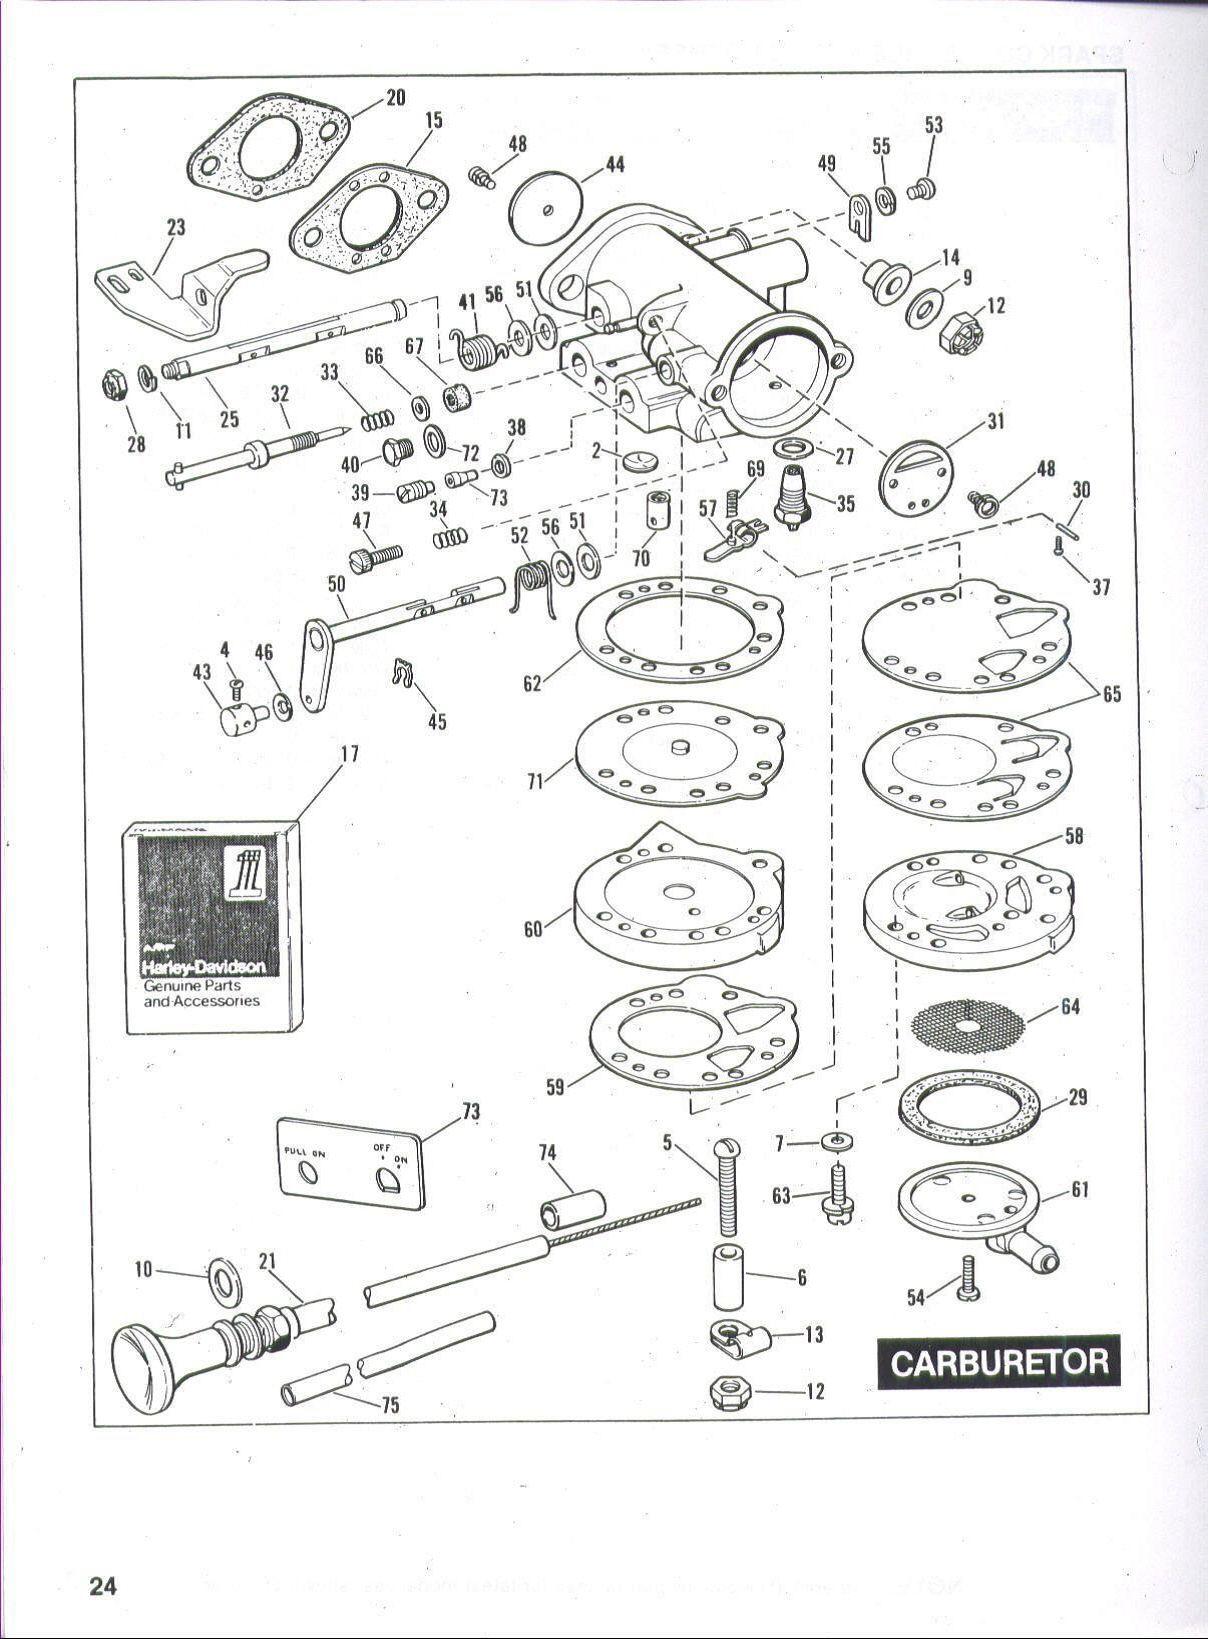 1982 columbia golf cart wiring diagram